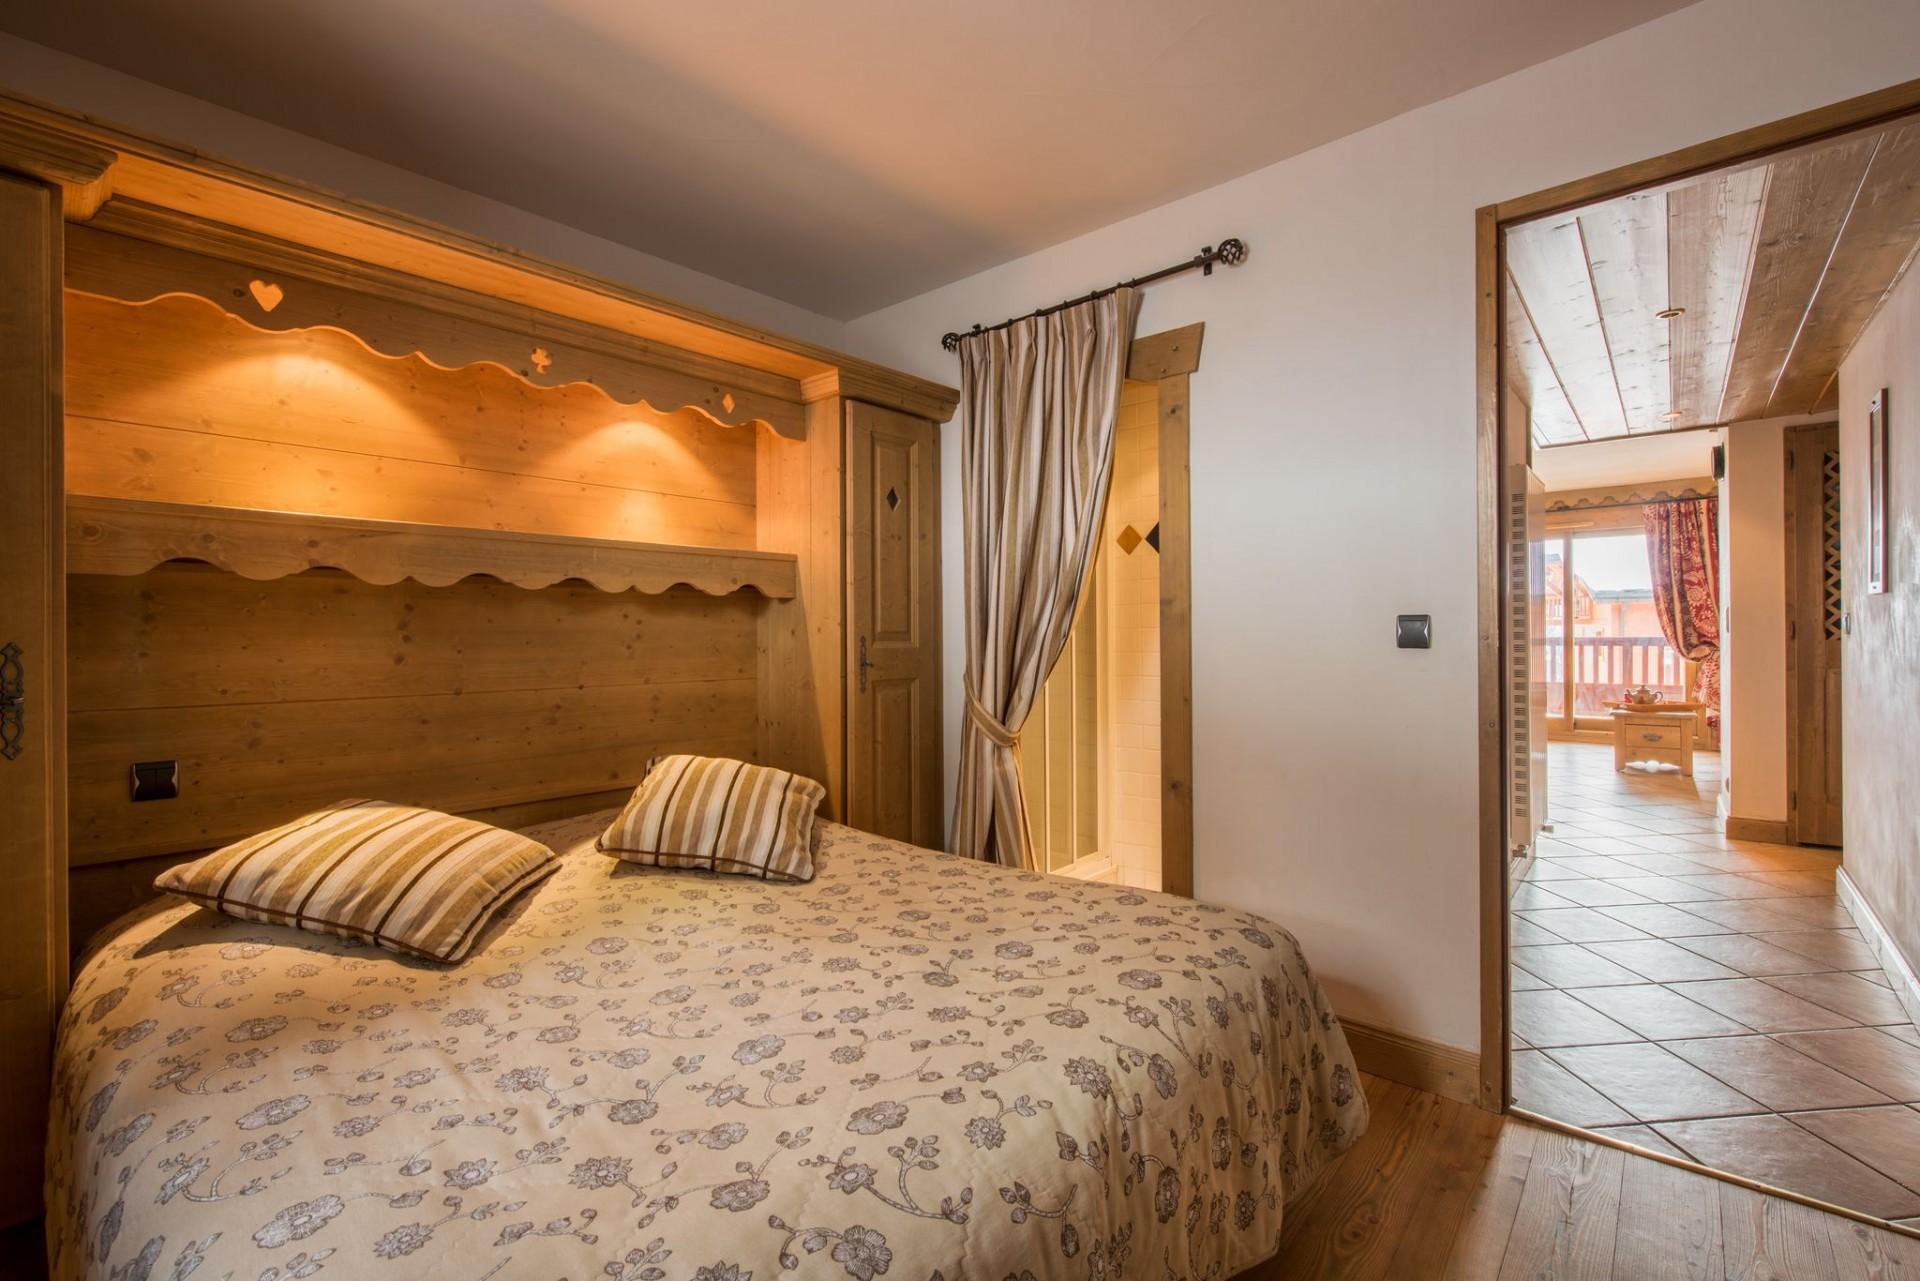 la-rosiere-location-appartement-luxe-lynx-sapphire-duplex